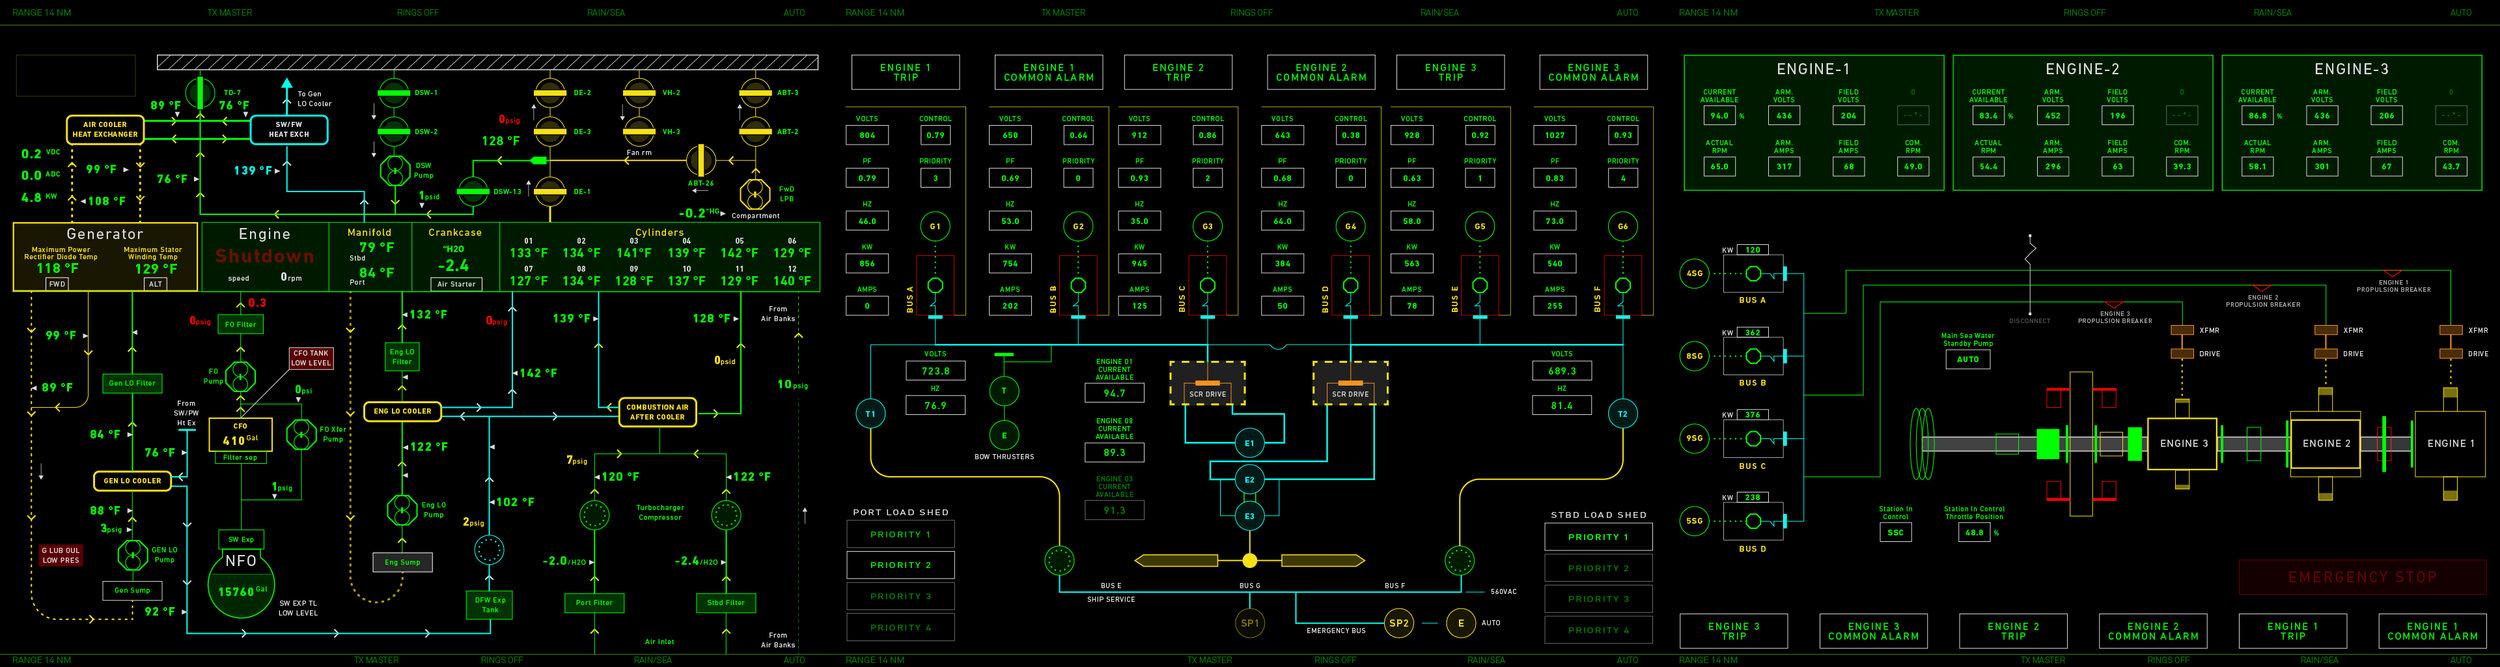 aa_engineroom_001.jpg